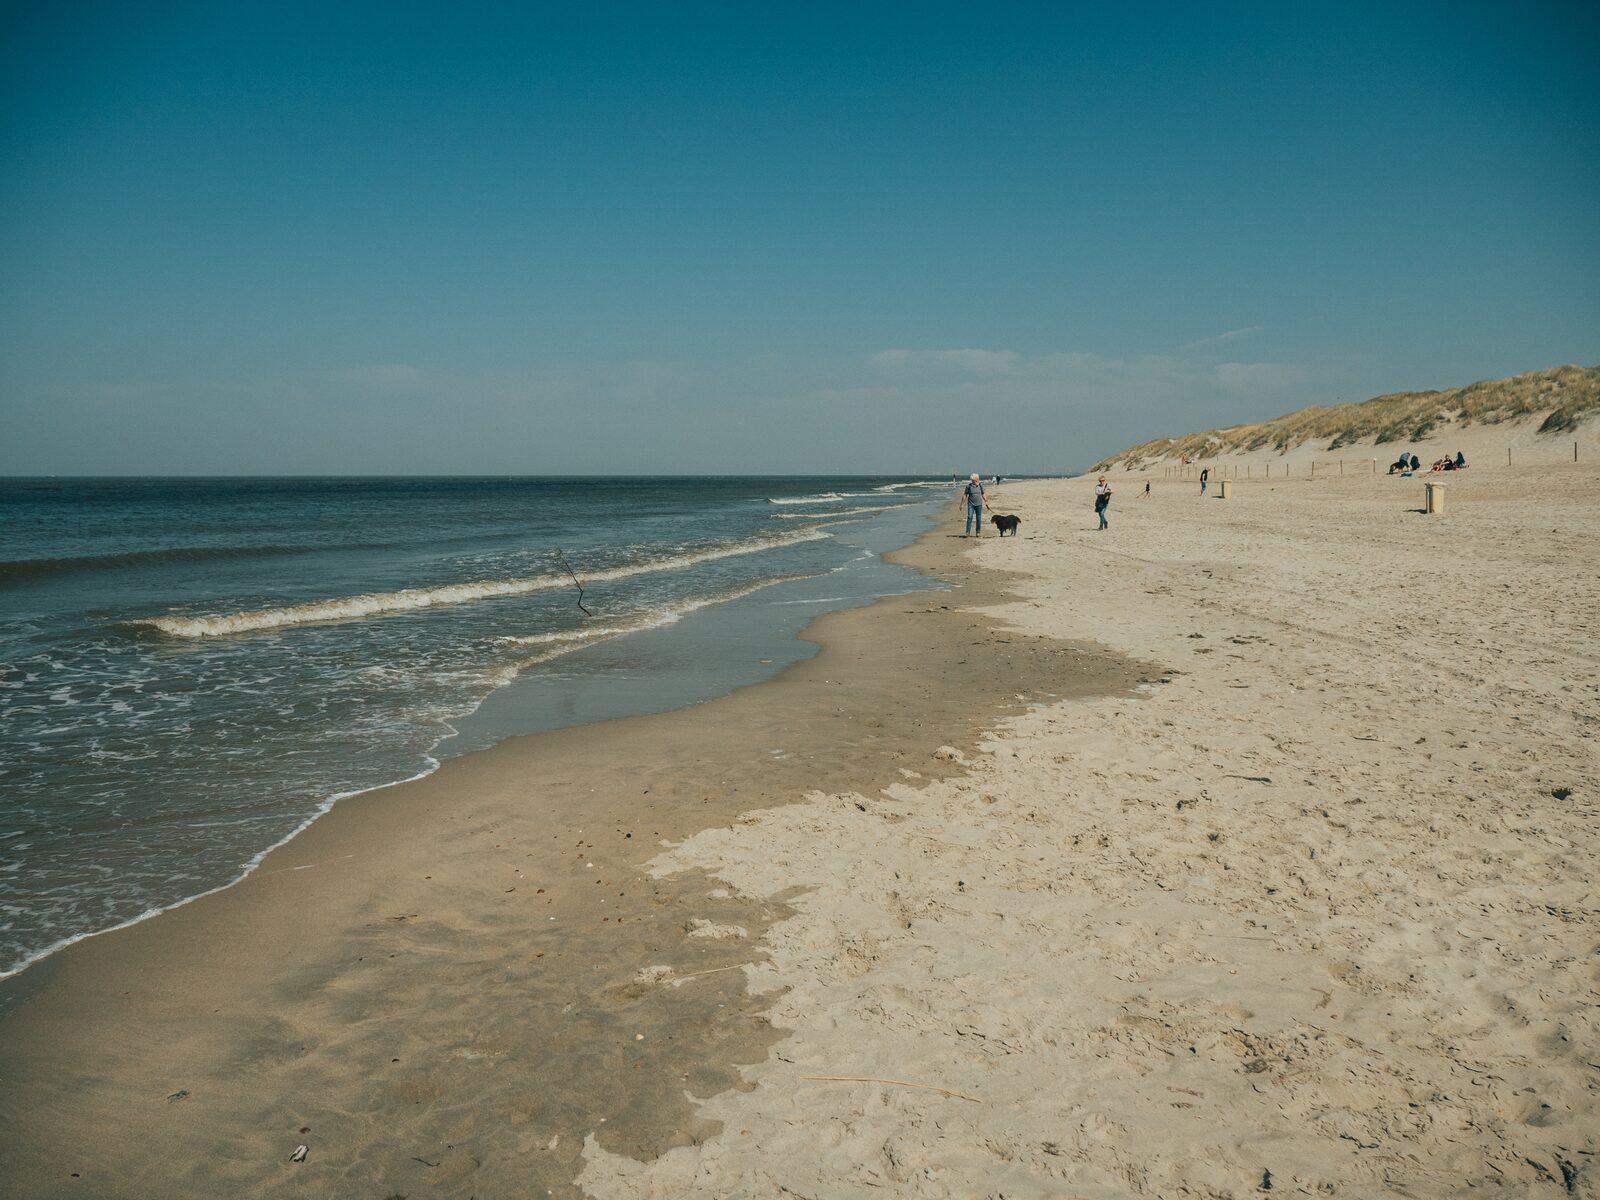 Strand van Ouddorp